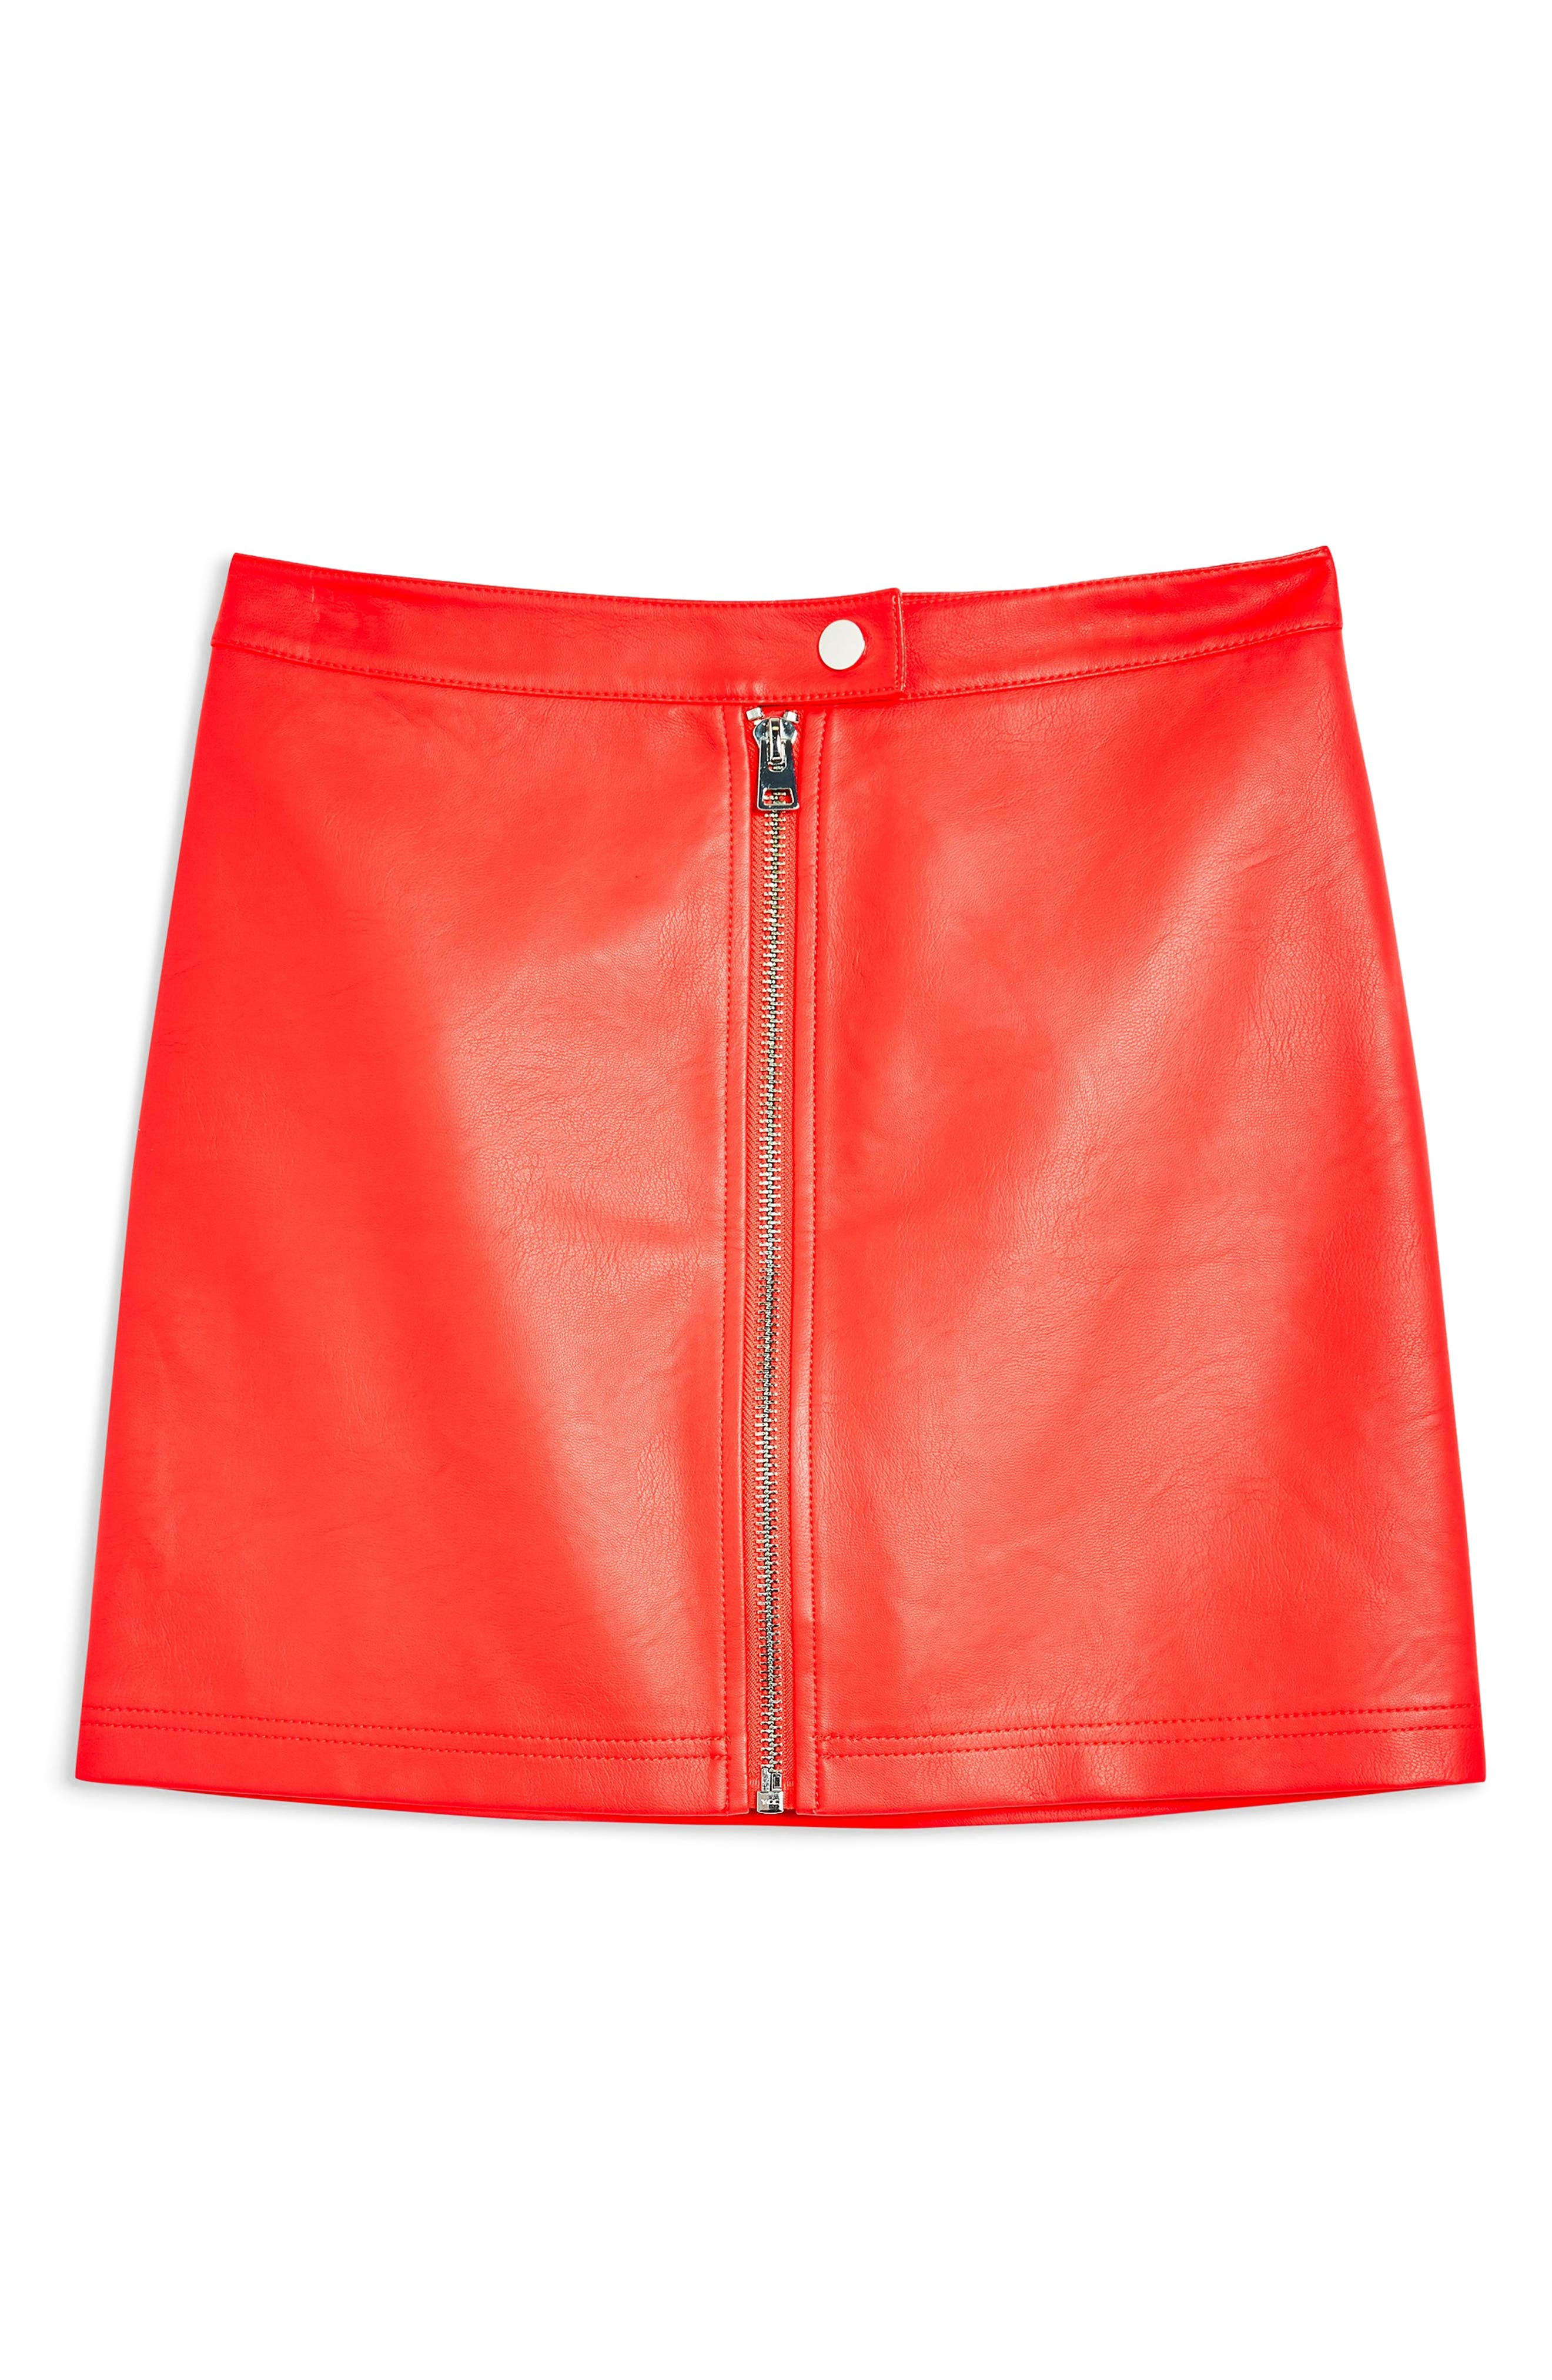 Penelope Faux Leather Miniskirt,                             Alternate thumbnail 3, color,                             RED